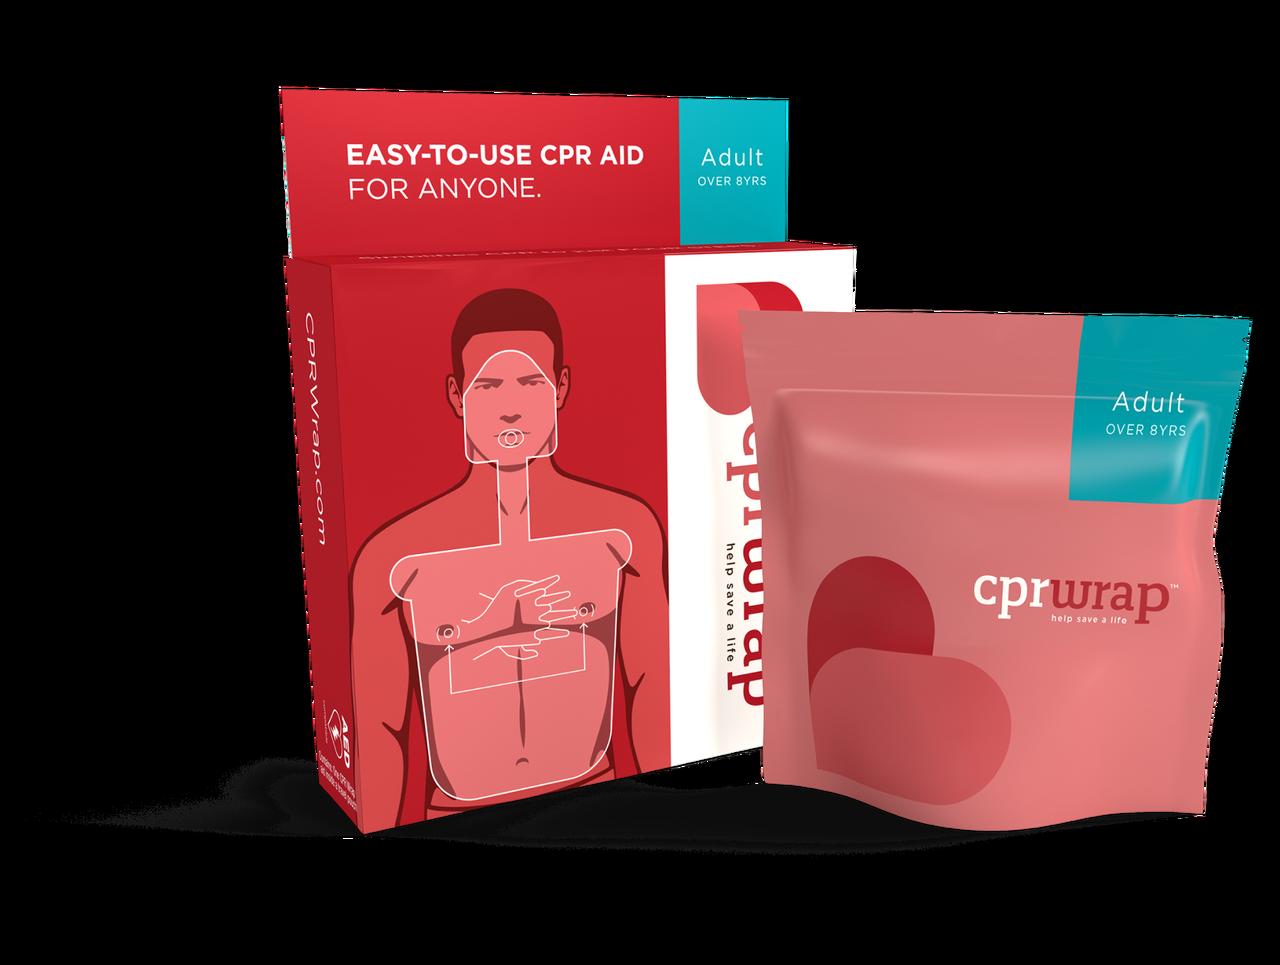 Adult CPRWrap® Aid